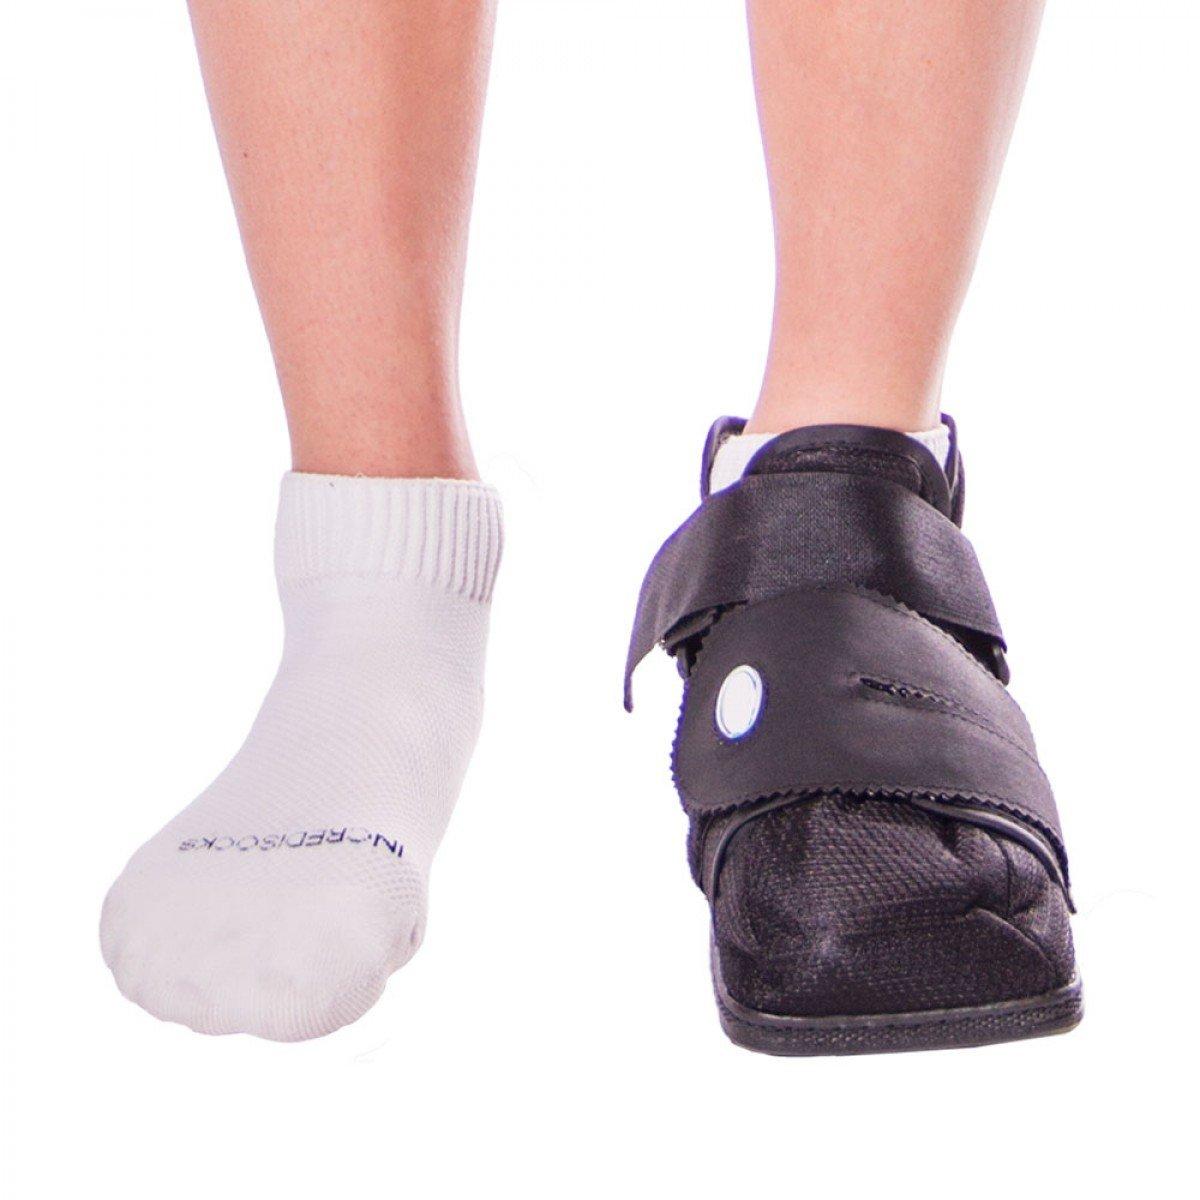 Closed toe medical walking shoe foot protection boot - Amazon Com Braceability Closed Toe Medical Walking Shoe Protection Boot S Health Personal Care